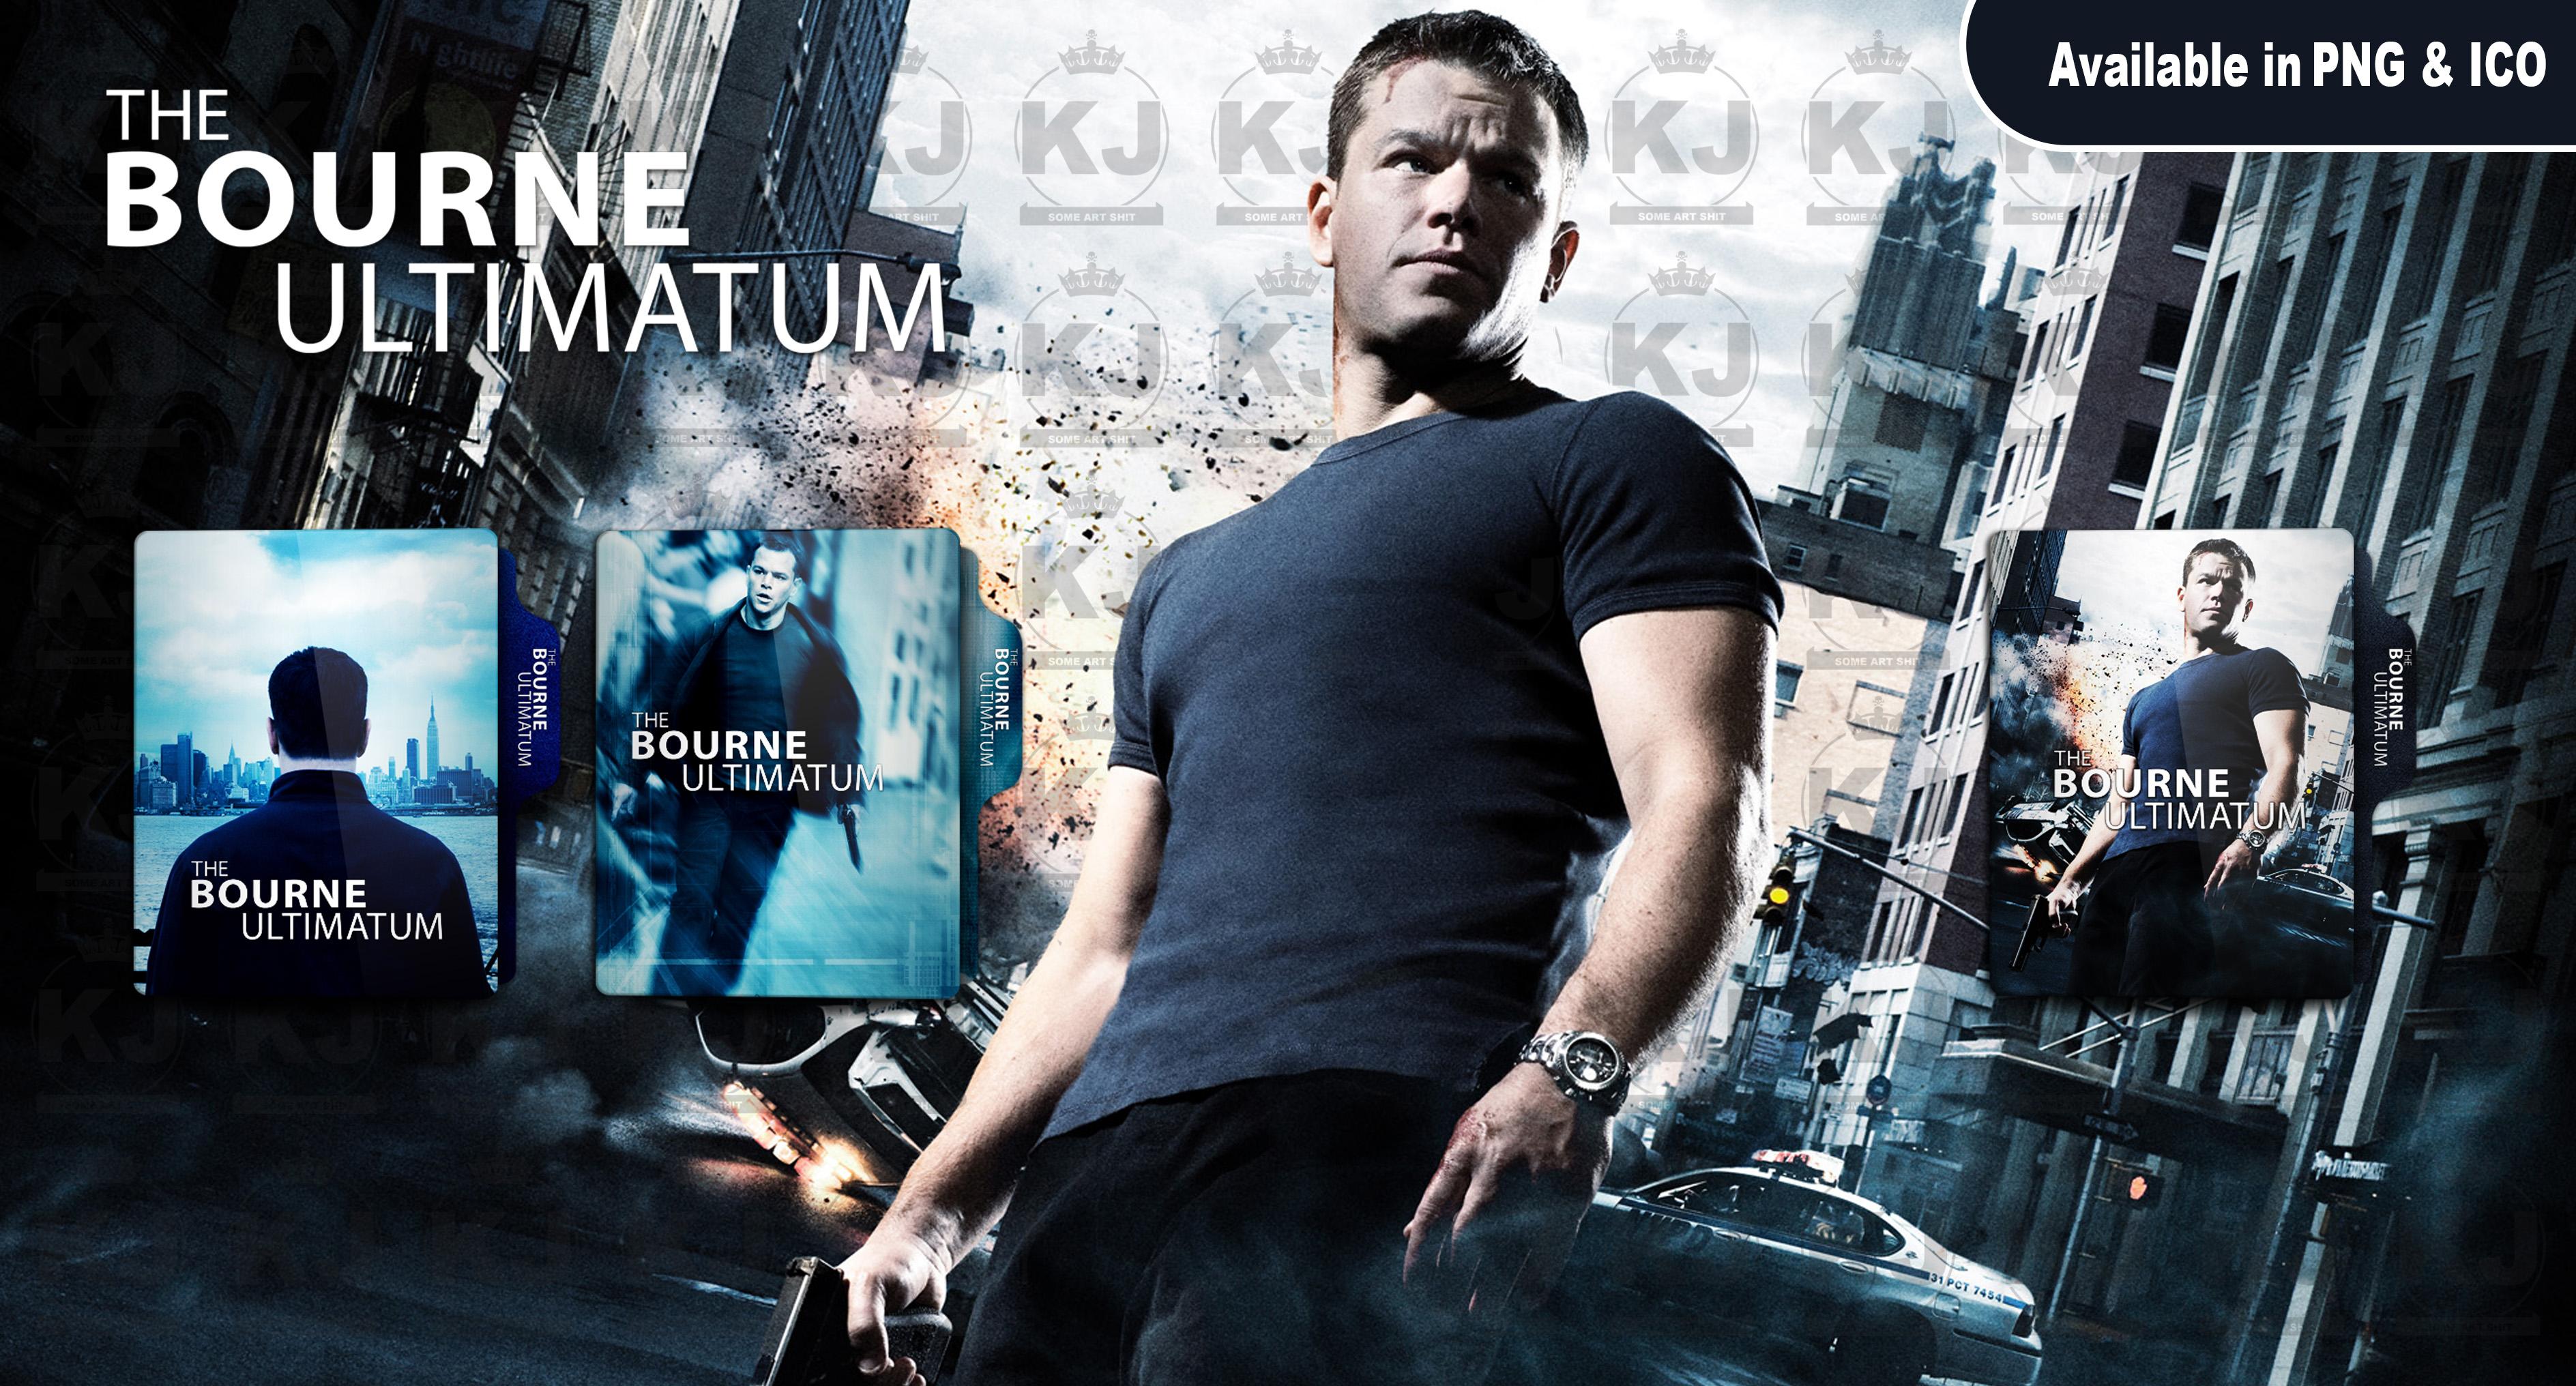 The Bourne Ultimatum 2007 By Kingjoe93 On Deviantart